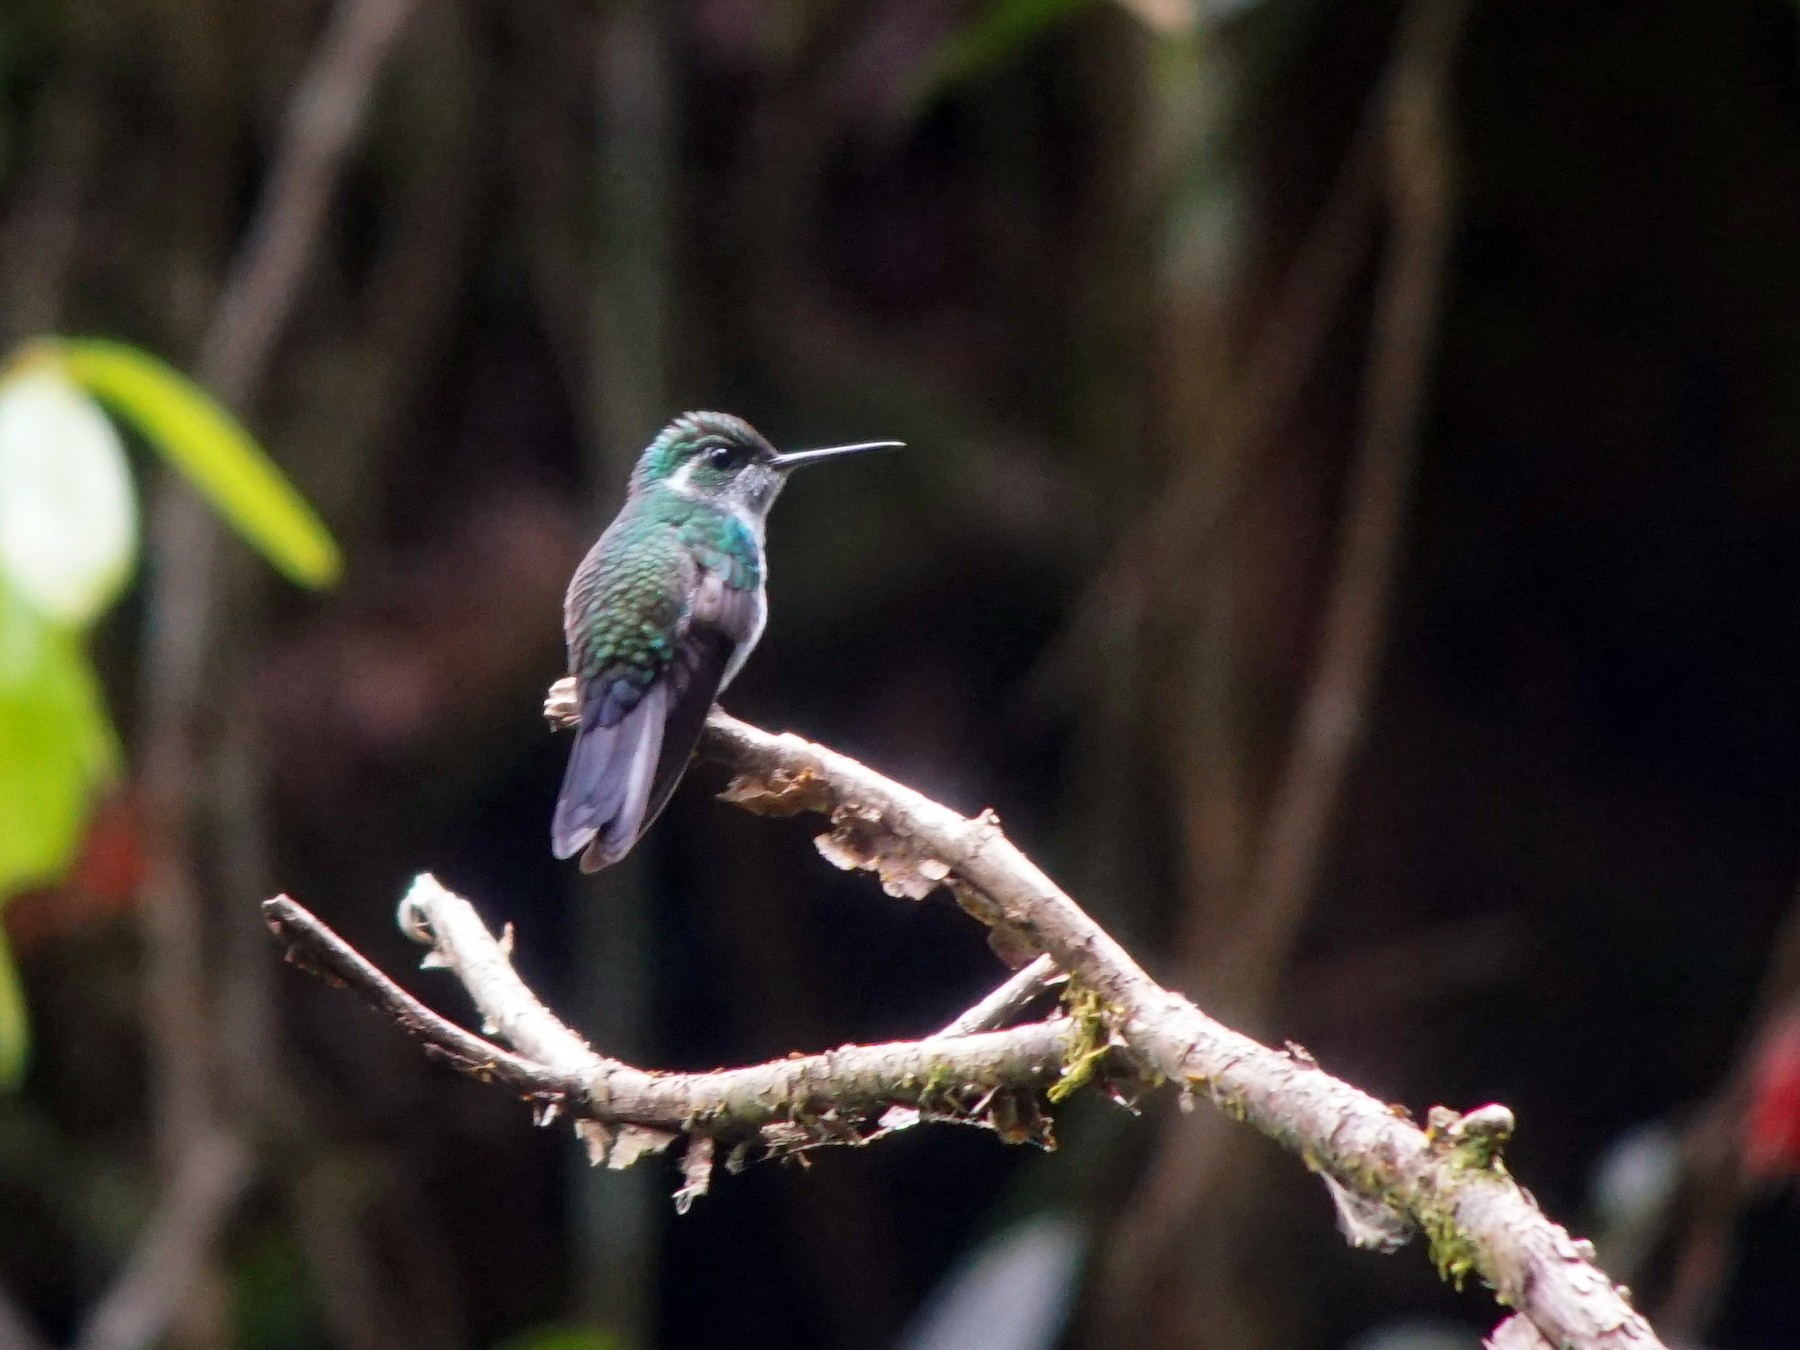 Green-breasted Mountain-gem - William Orellana (Beaks and Peaks)